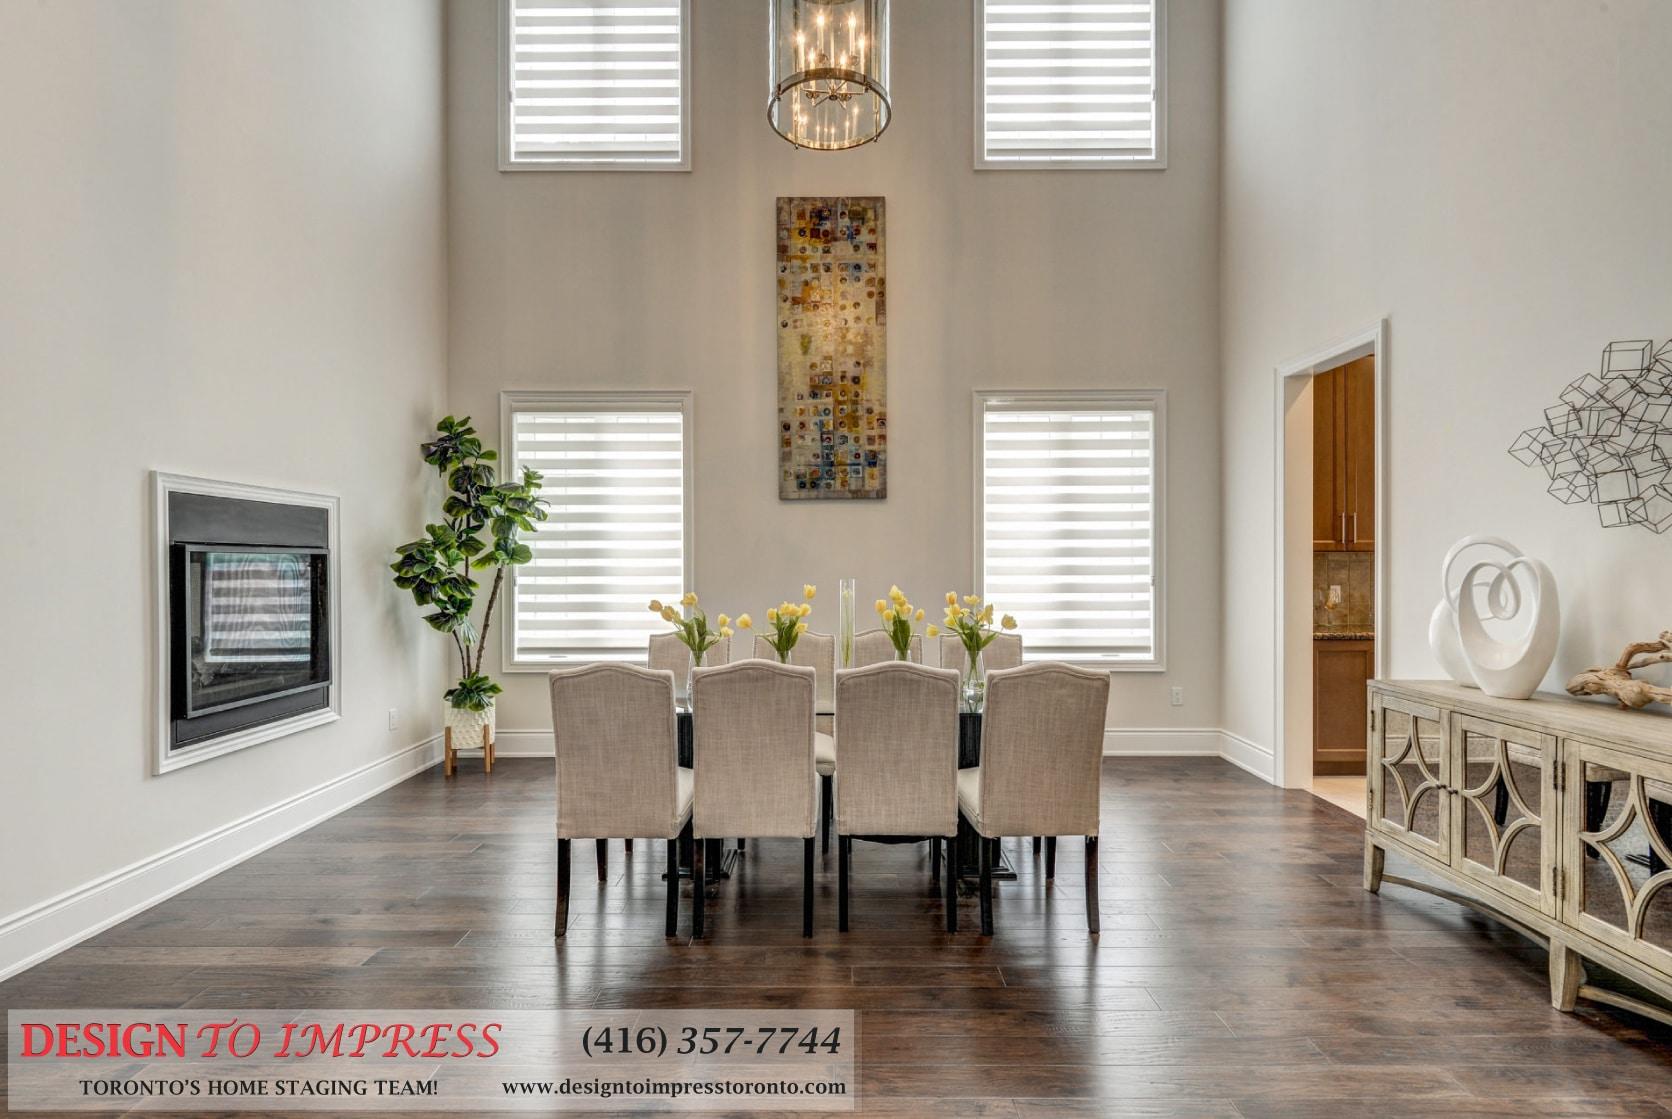 Dress to Impress Home Staging & Design